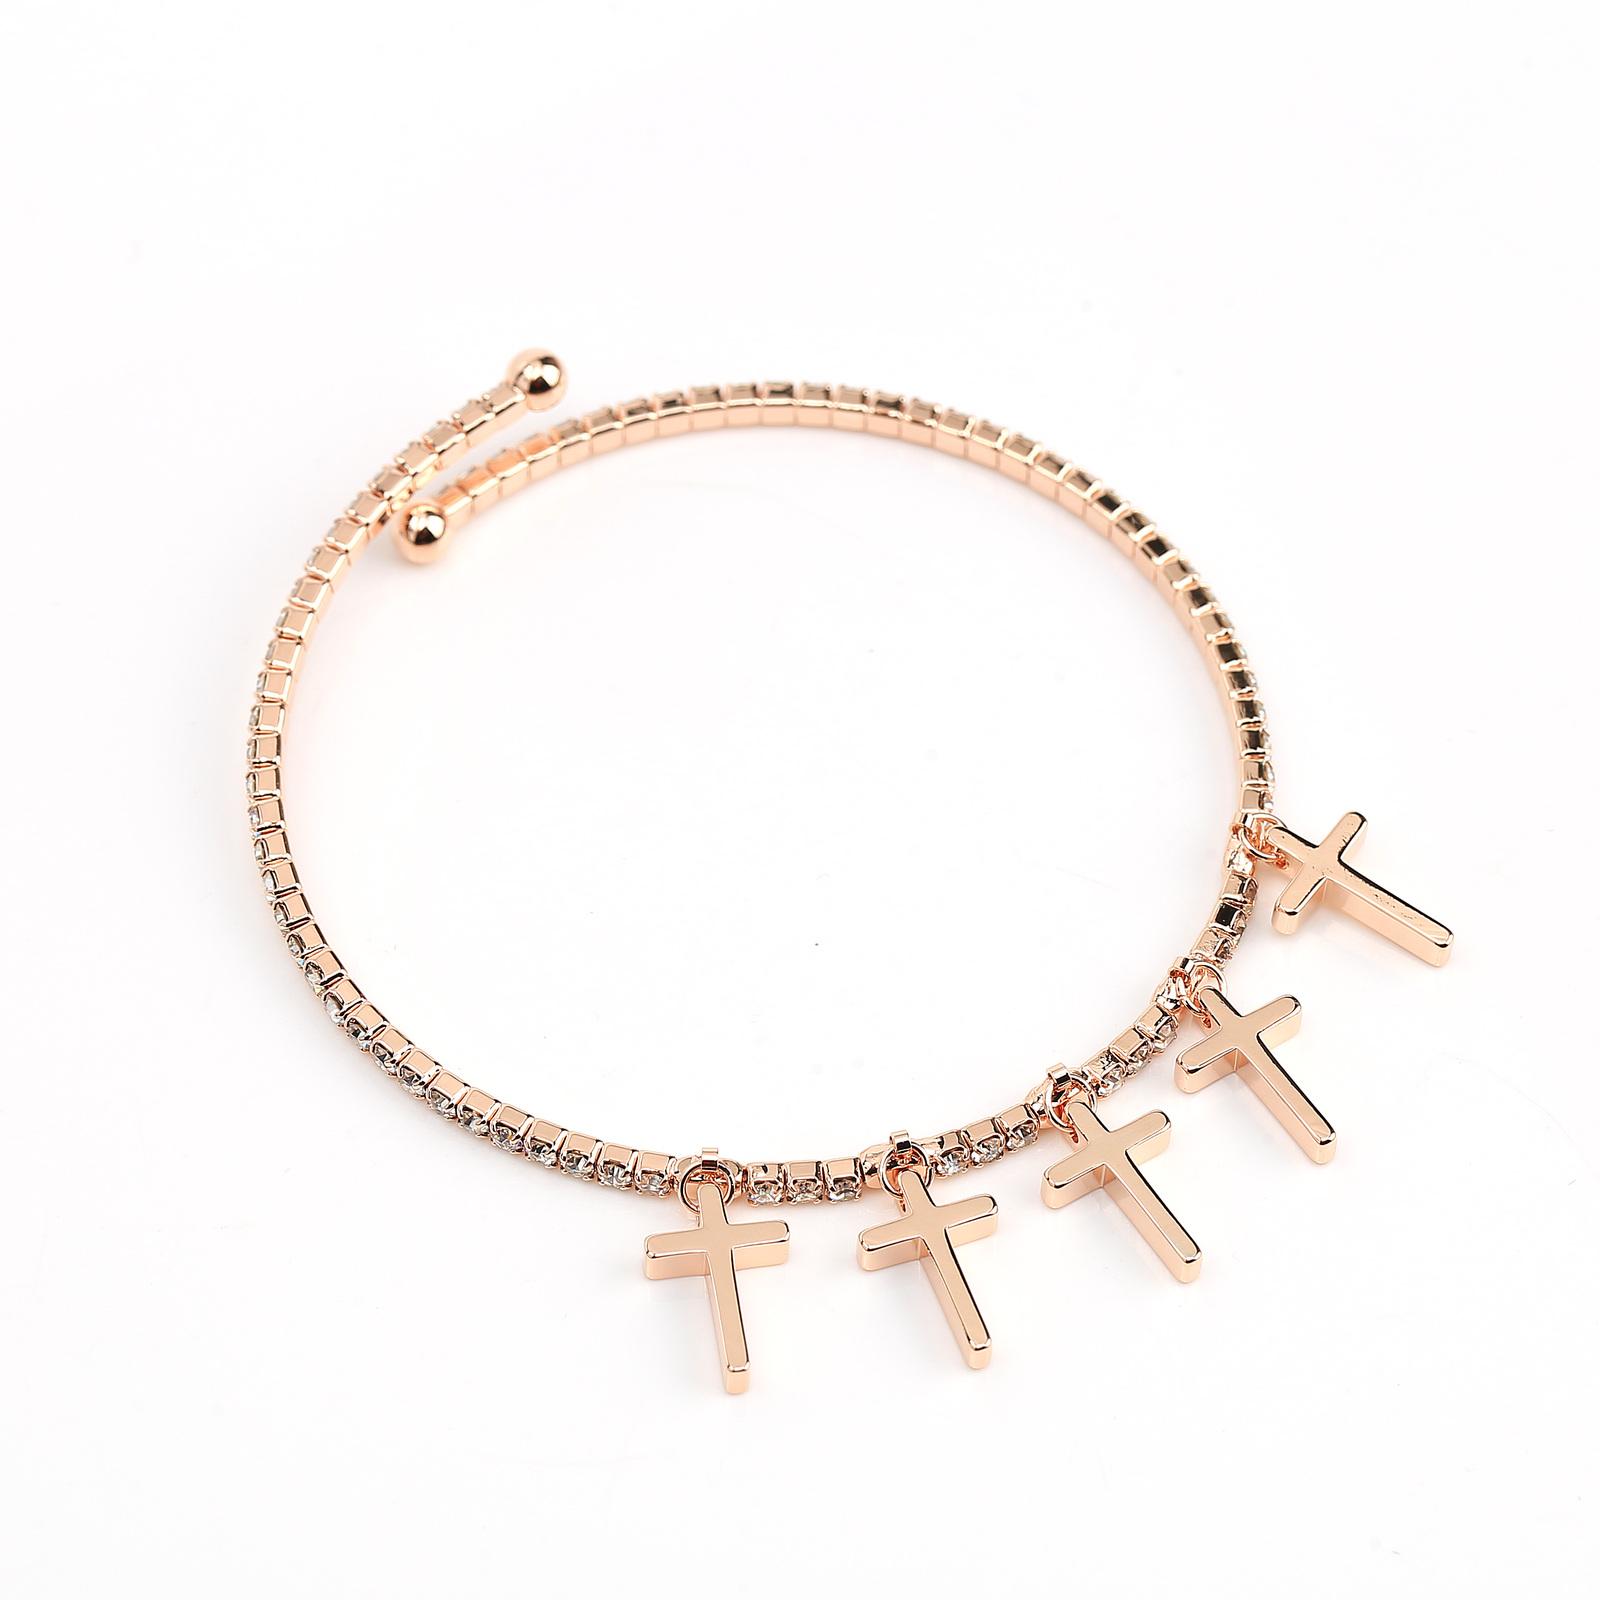 UE- Designer Rose Tone Bangle Bracelet With Swarovski Style Crystals & Crosses